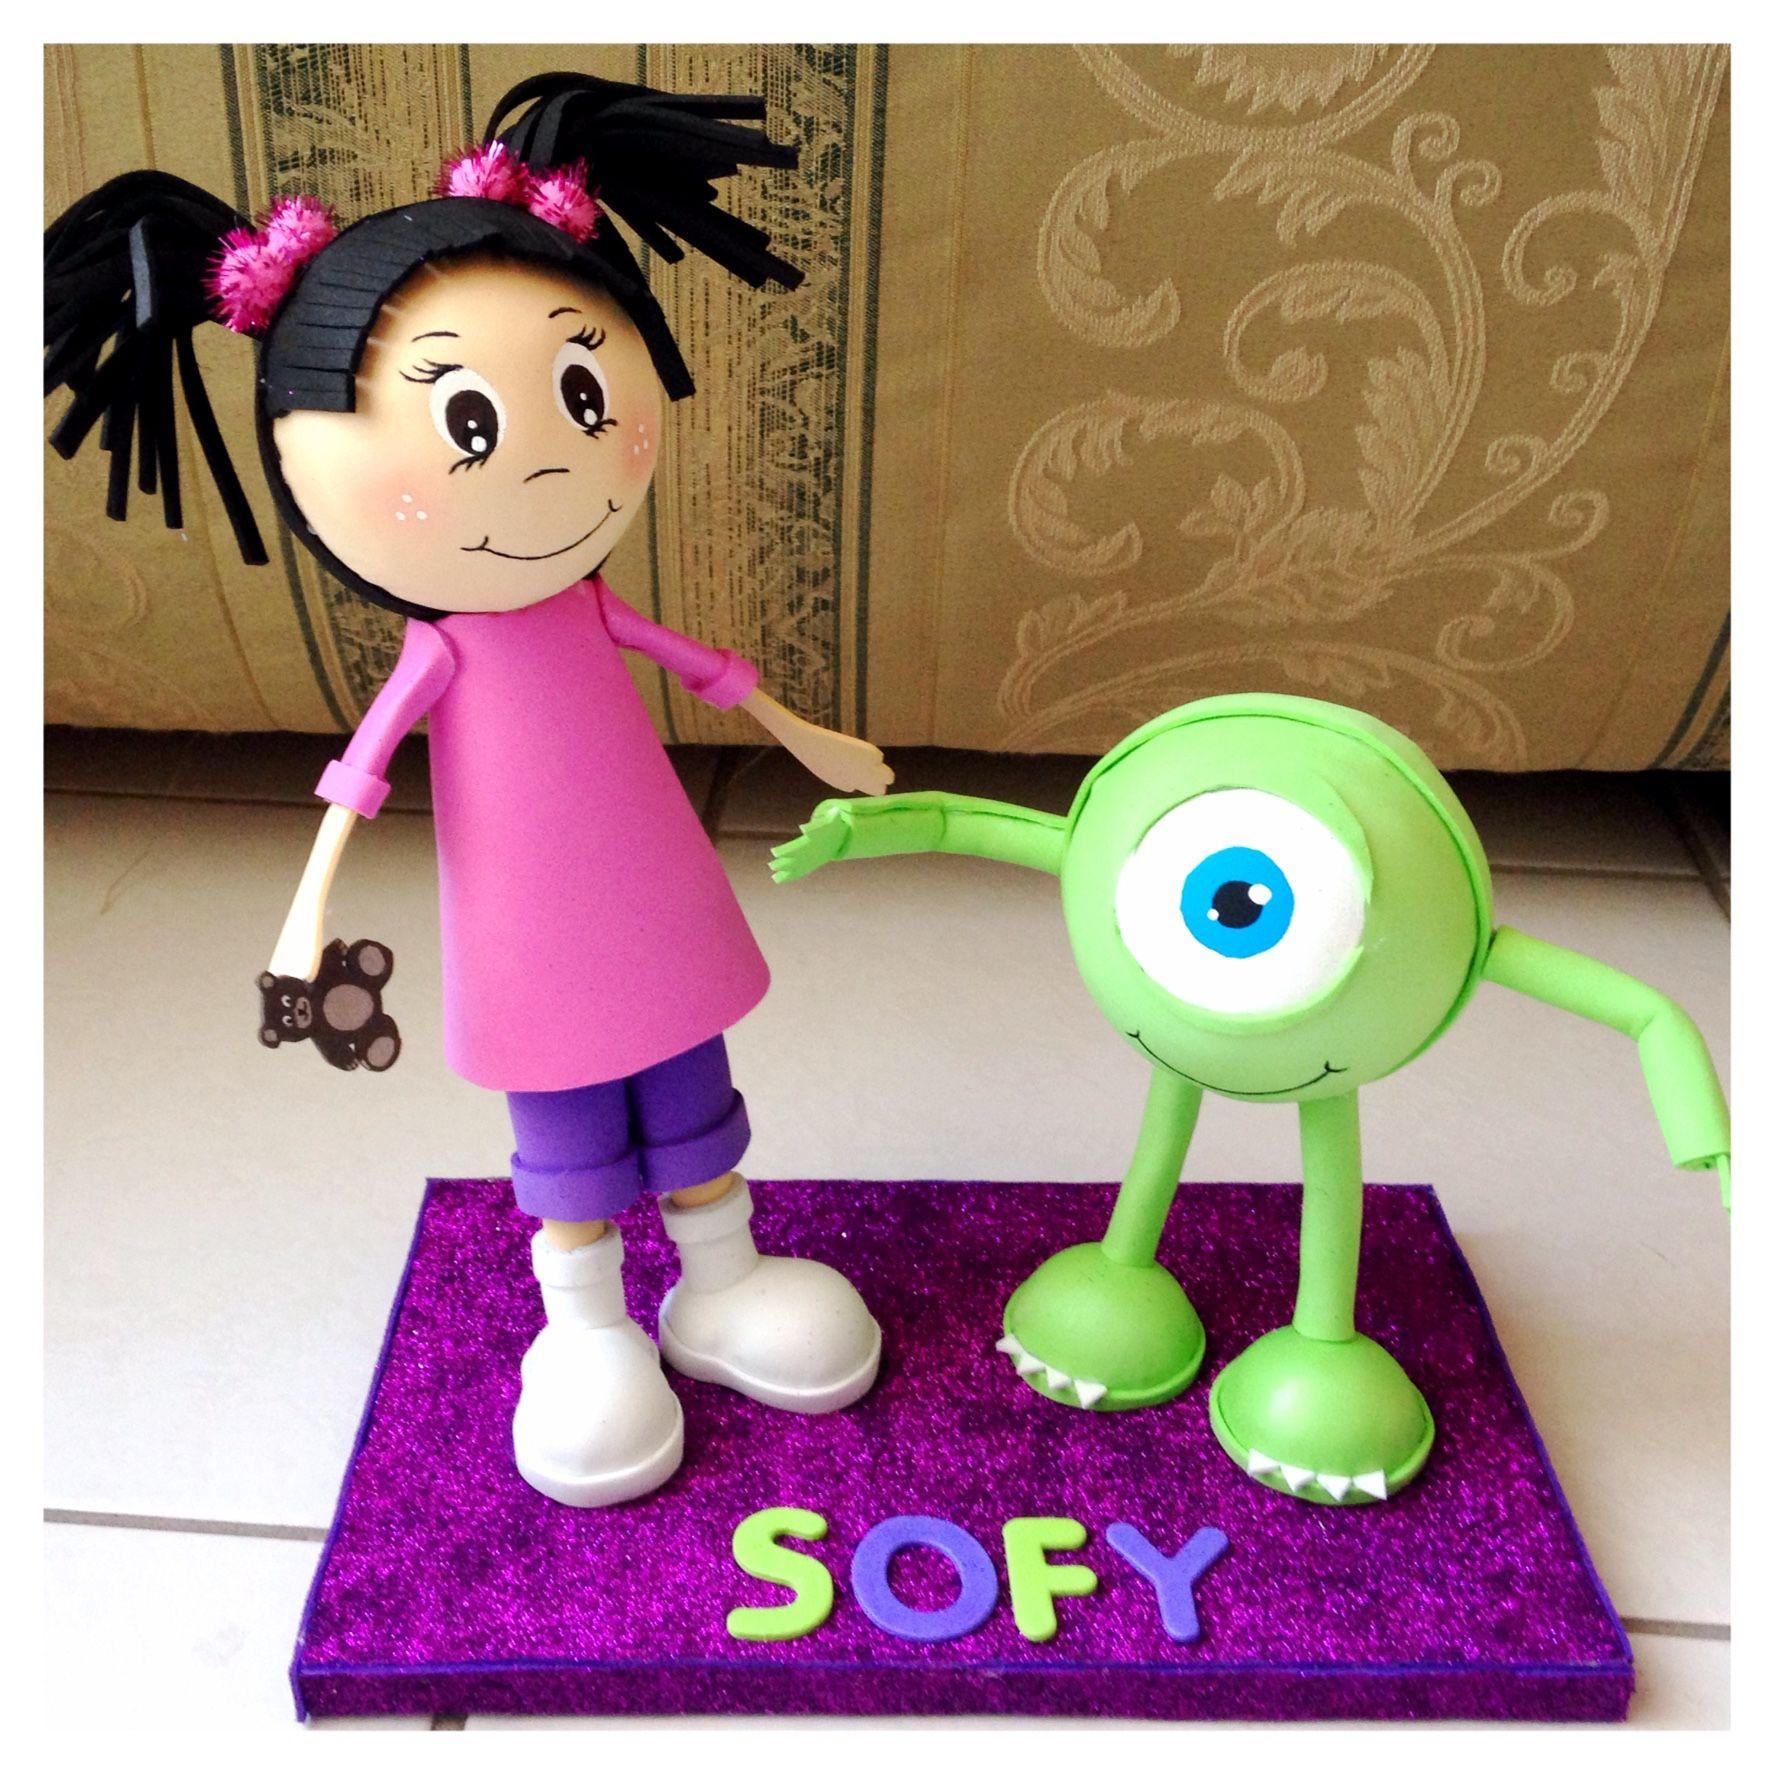 Fofucha Boo and Mike Wazowski Monster Inc. | Fofuchas | Pinterest